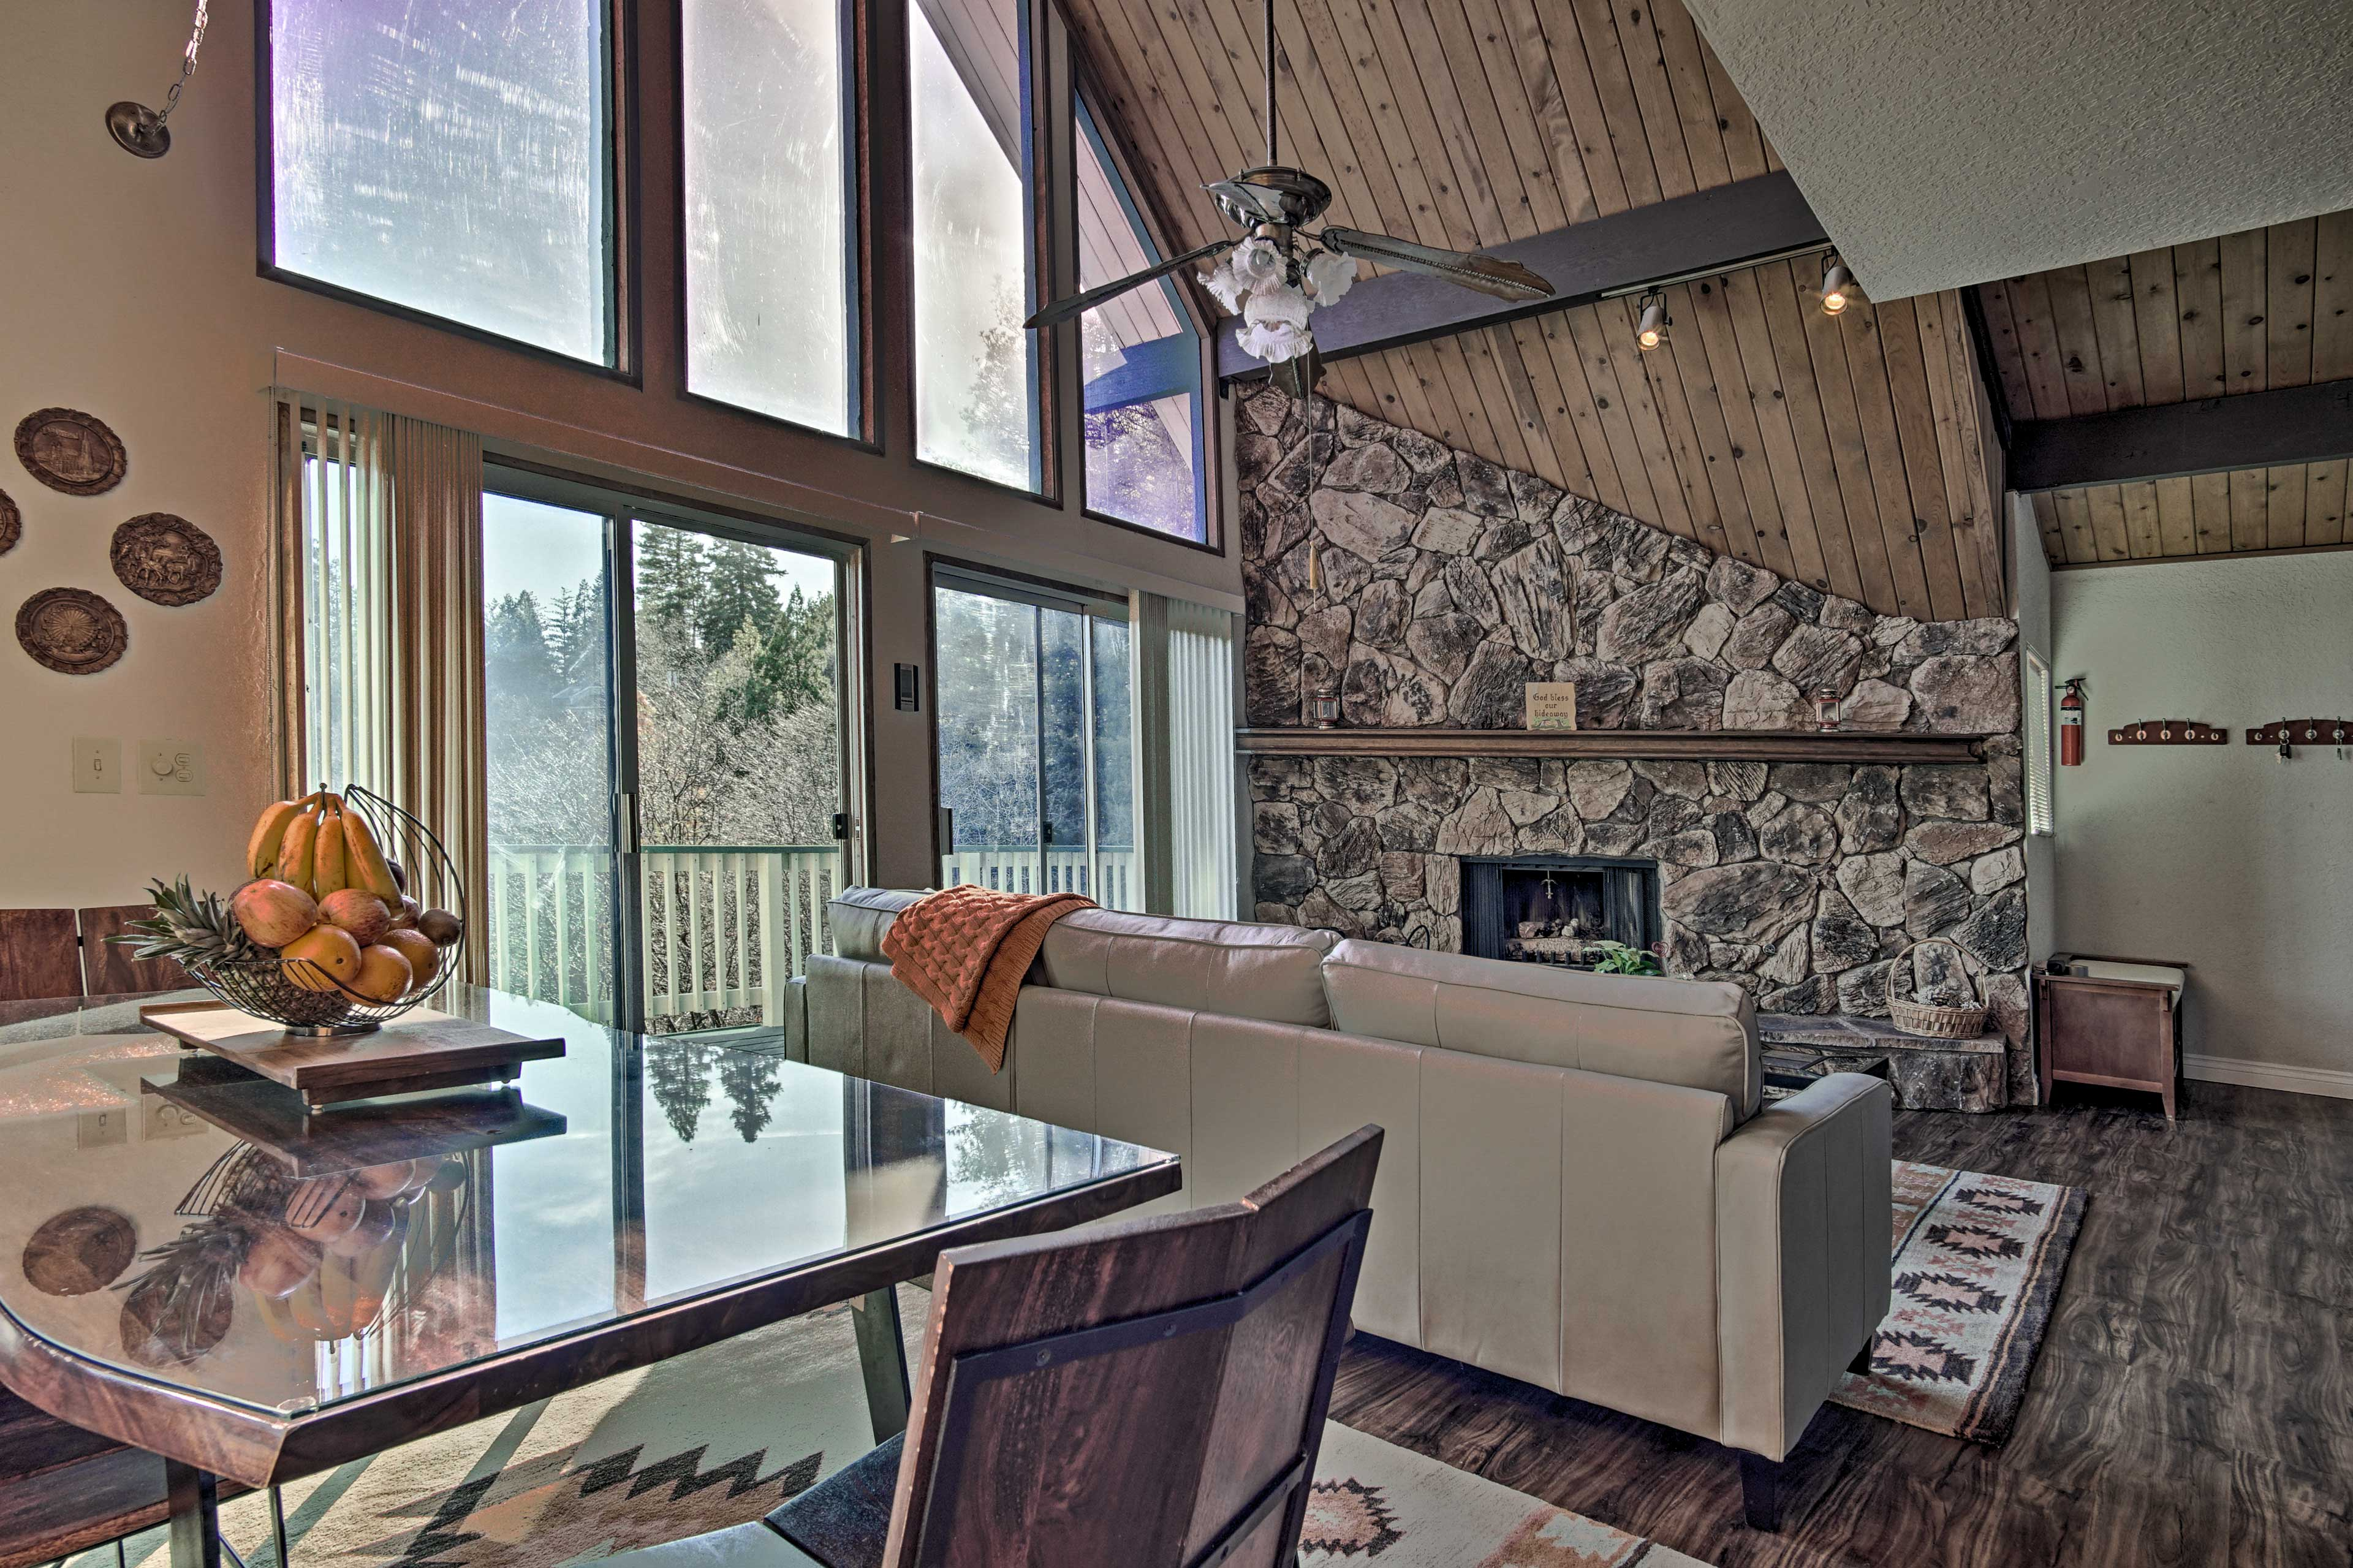 Natural light illuminates the interior.